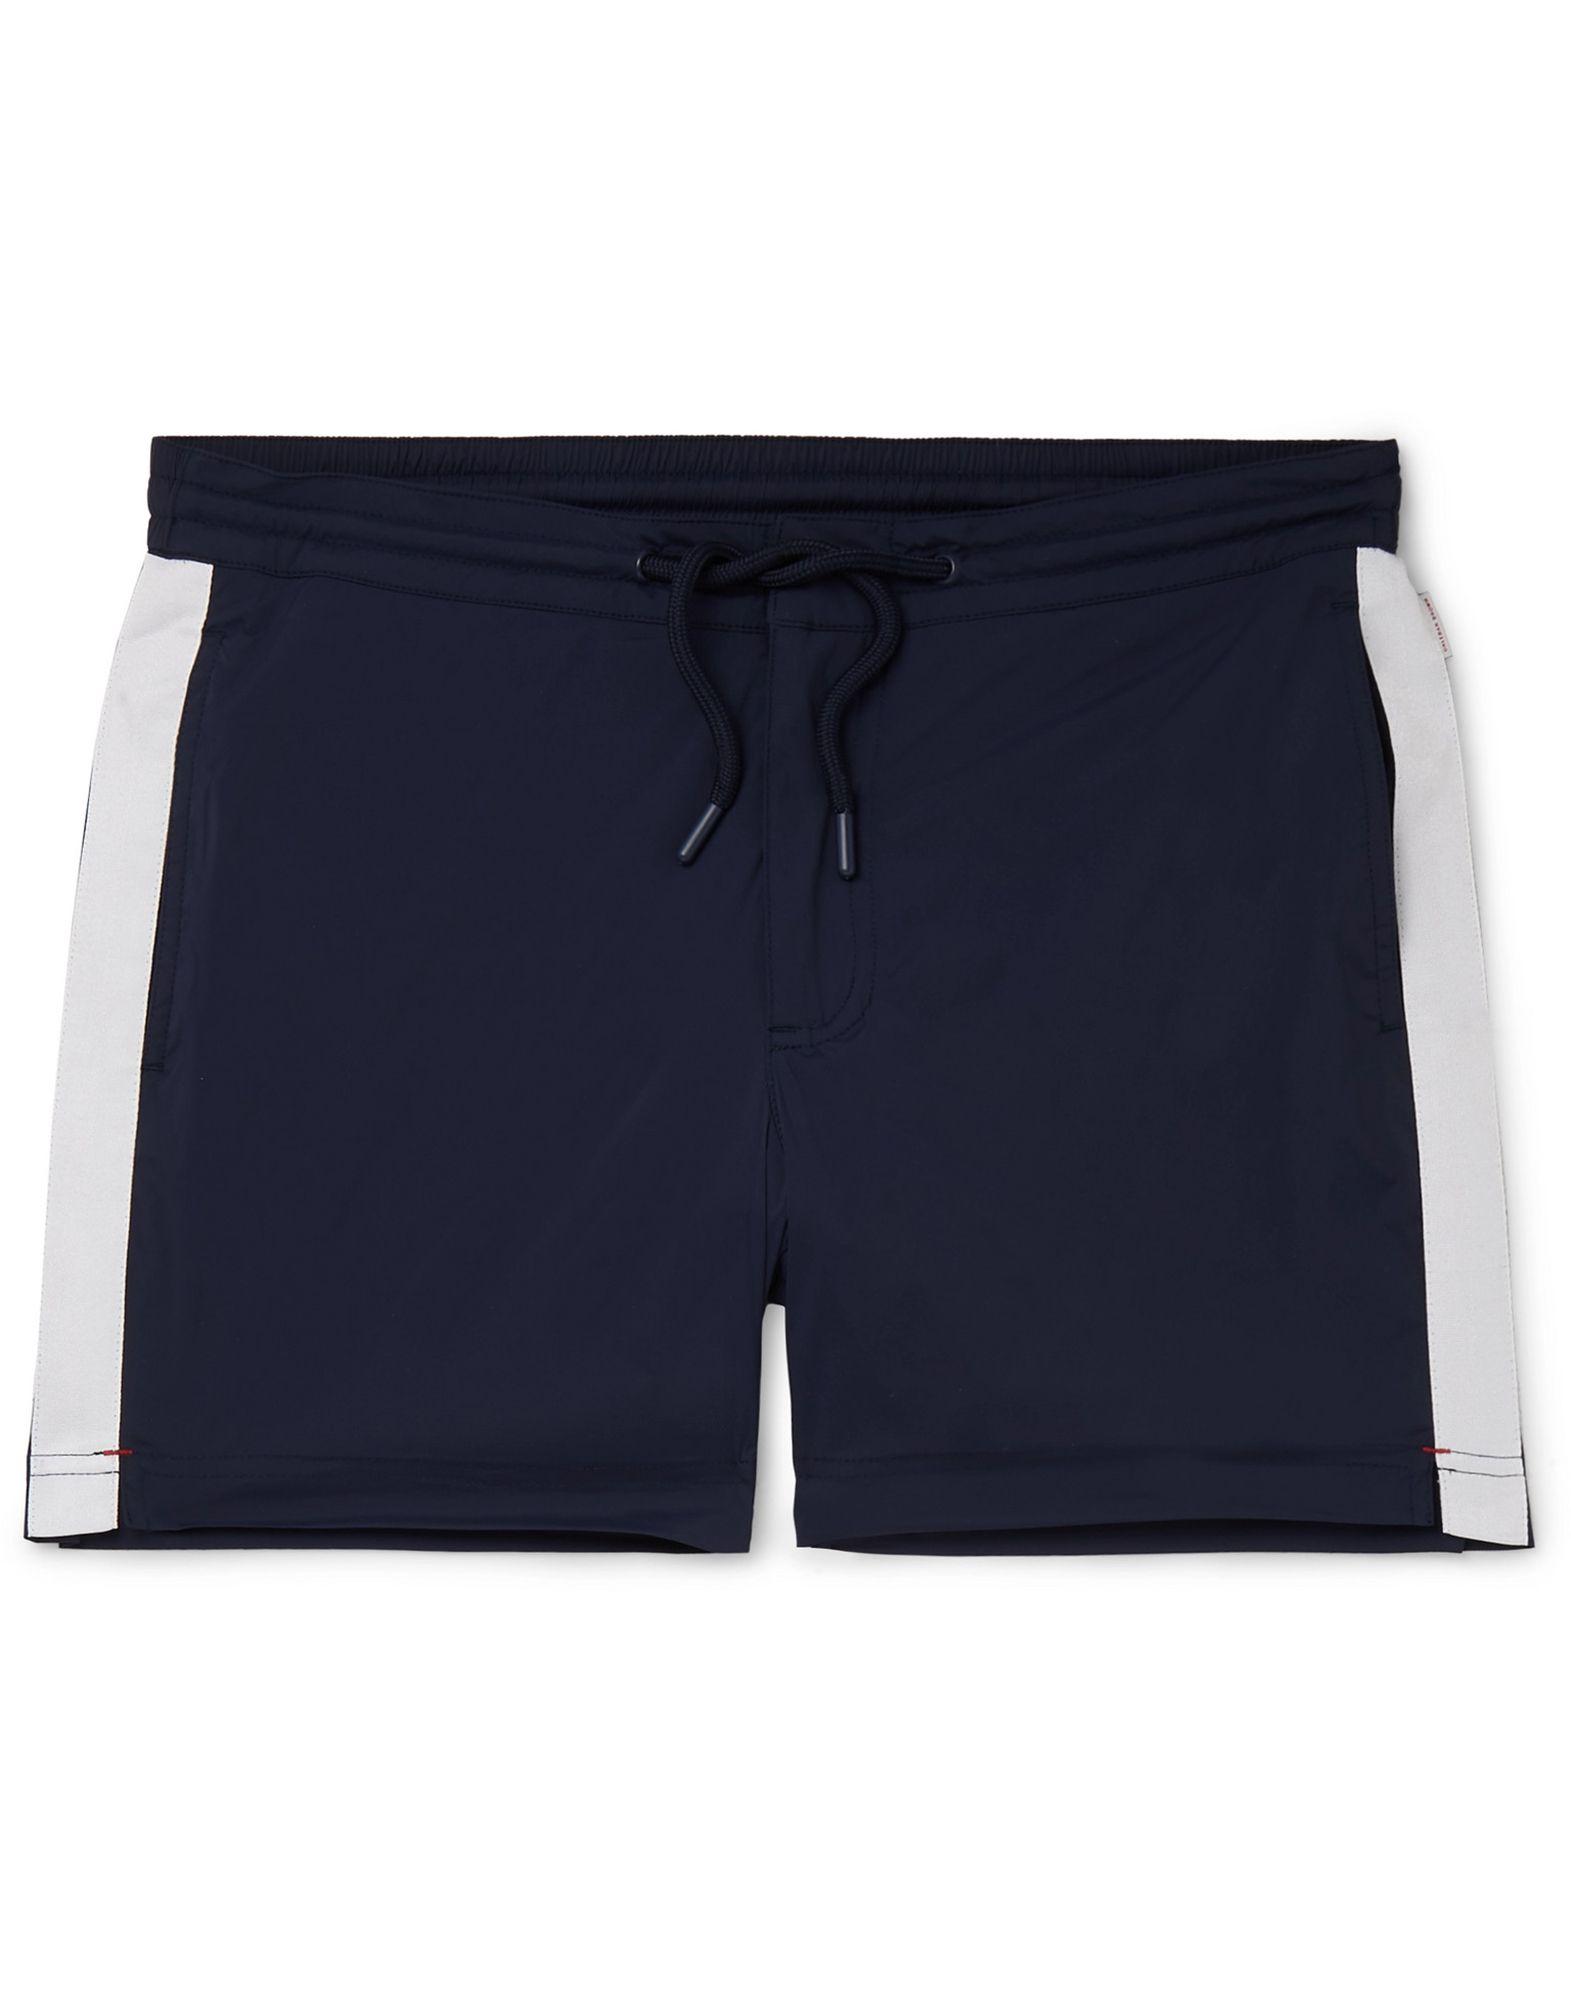 ORLEBAR BROWN Swim trunks - Item 47271457